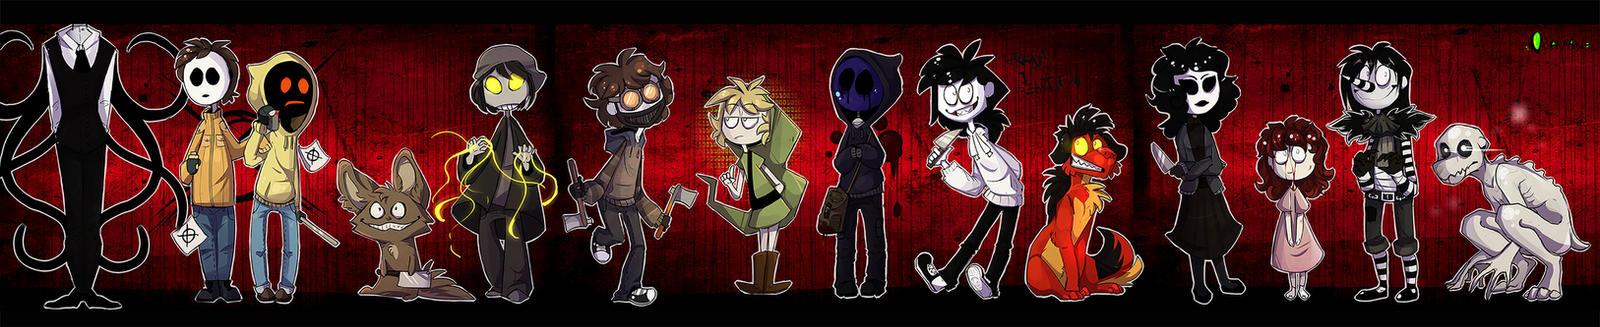 |Creepypasta Fanart| Cartoon CP Monsters by 0ktavian